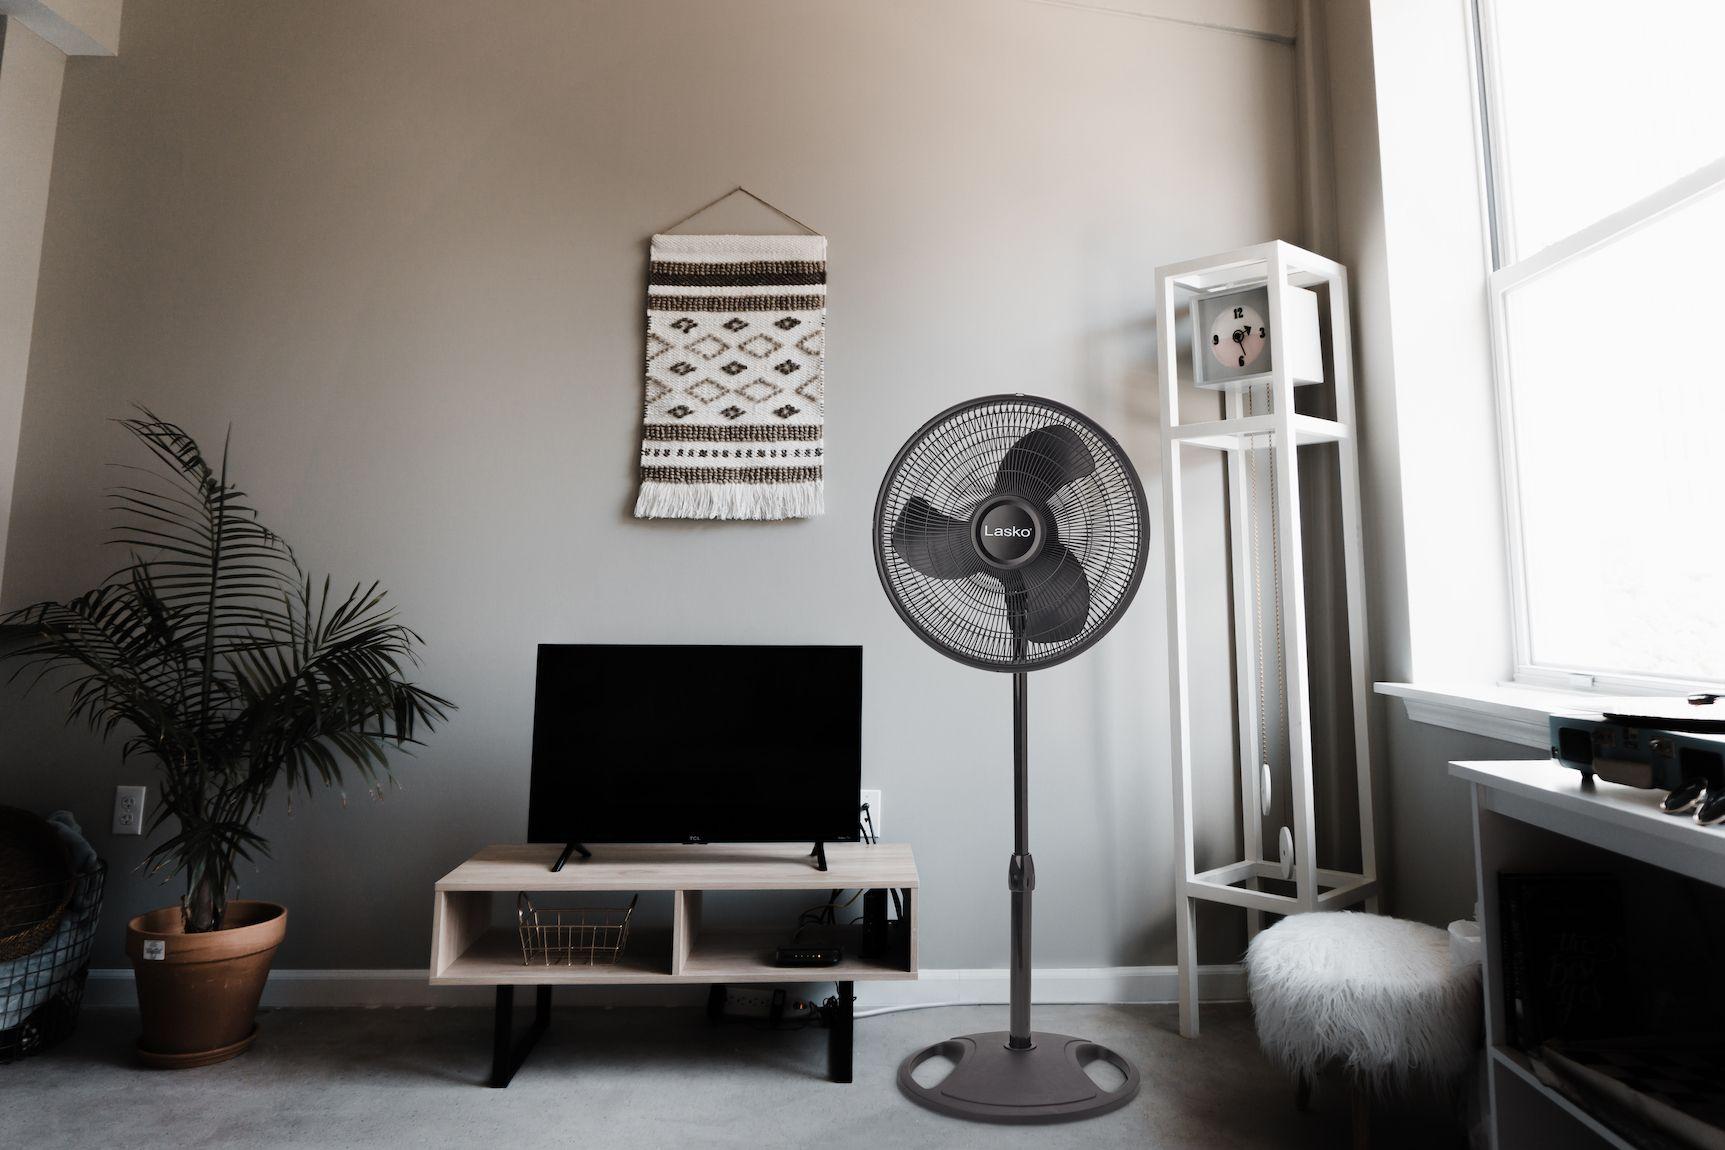 Lasko's 16″ Oscillating Stand Fan Living room essentials